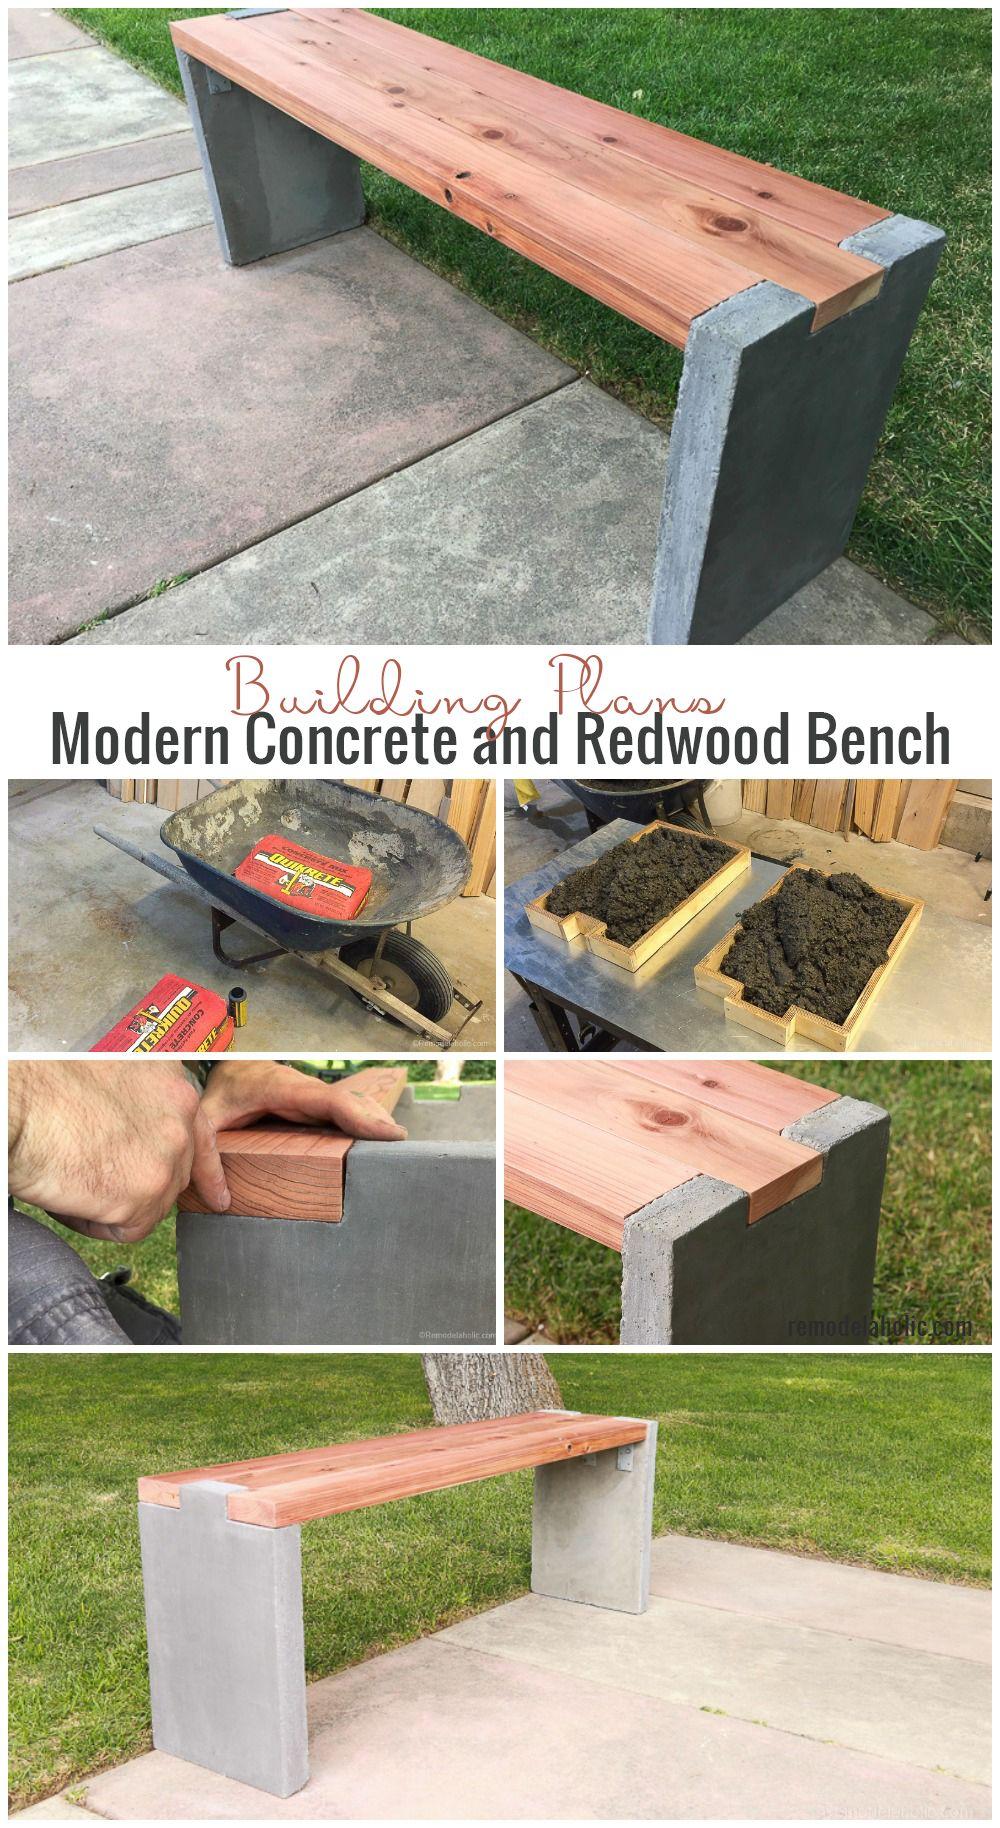 Redwood Patio Furniture Home Depot: DIY Modern Concrete And Redwood Bench Building Plans